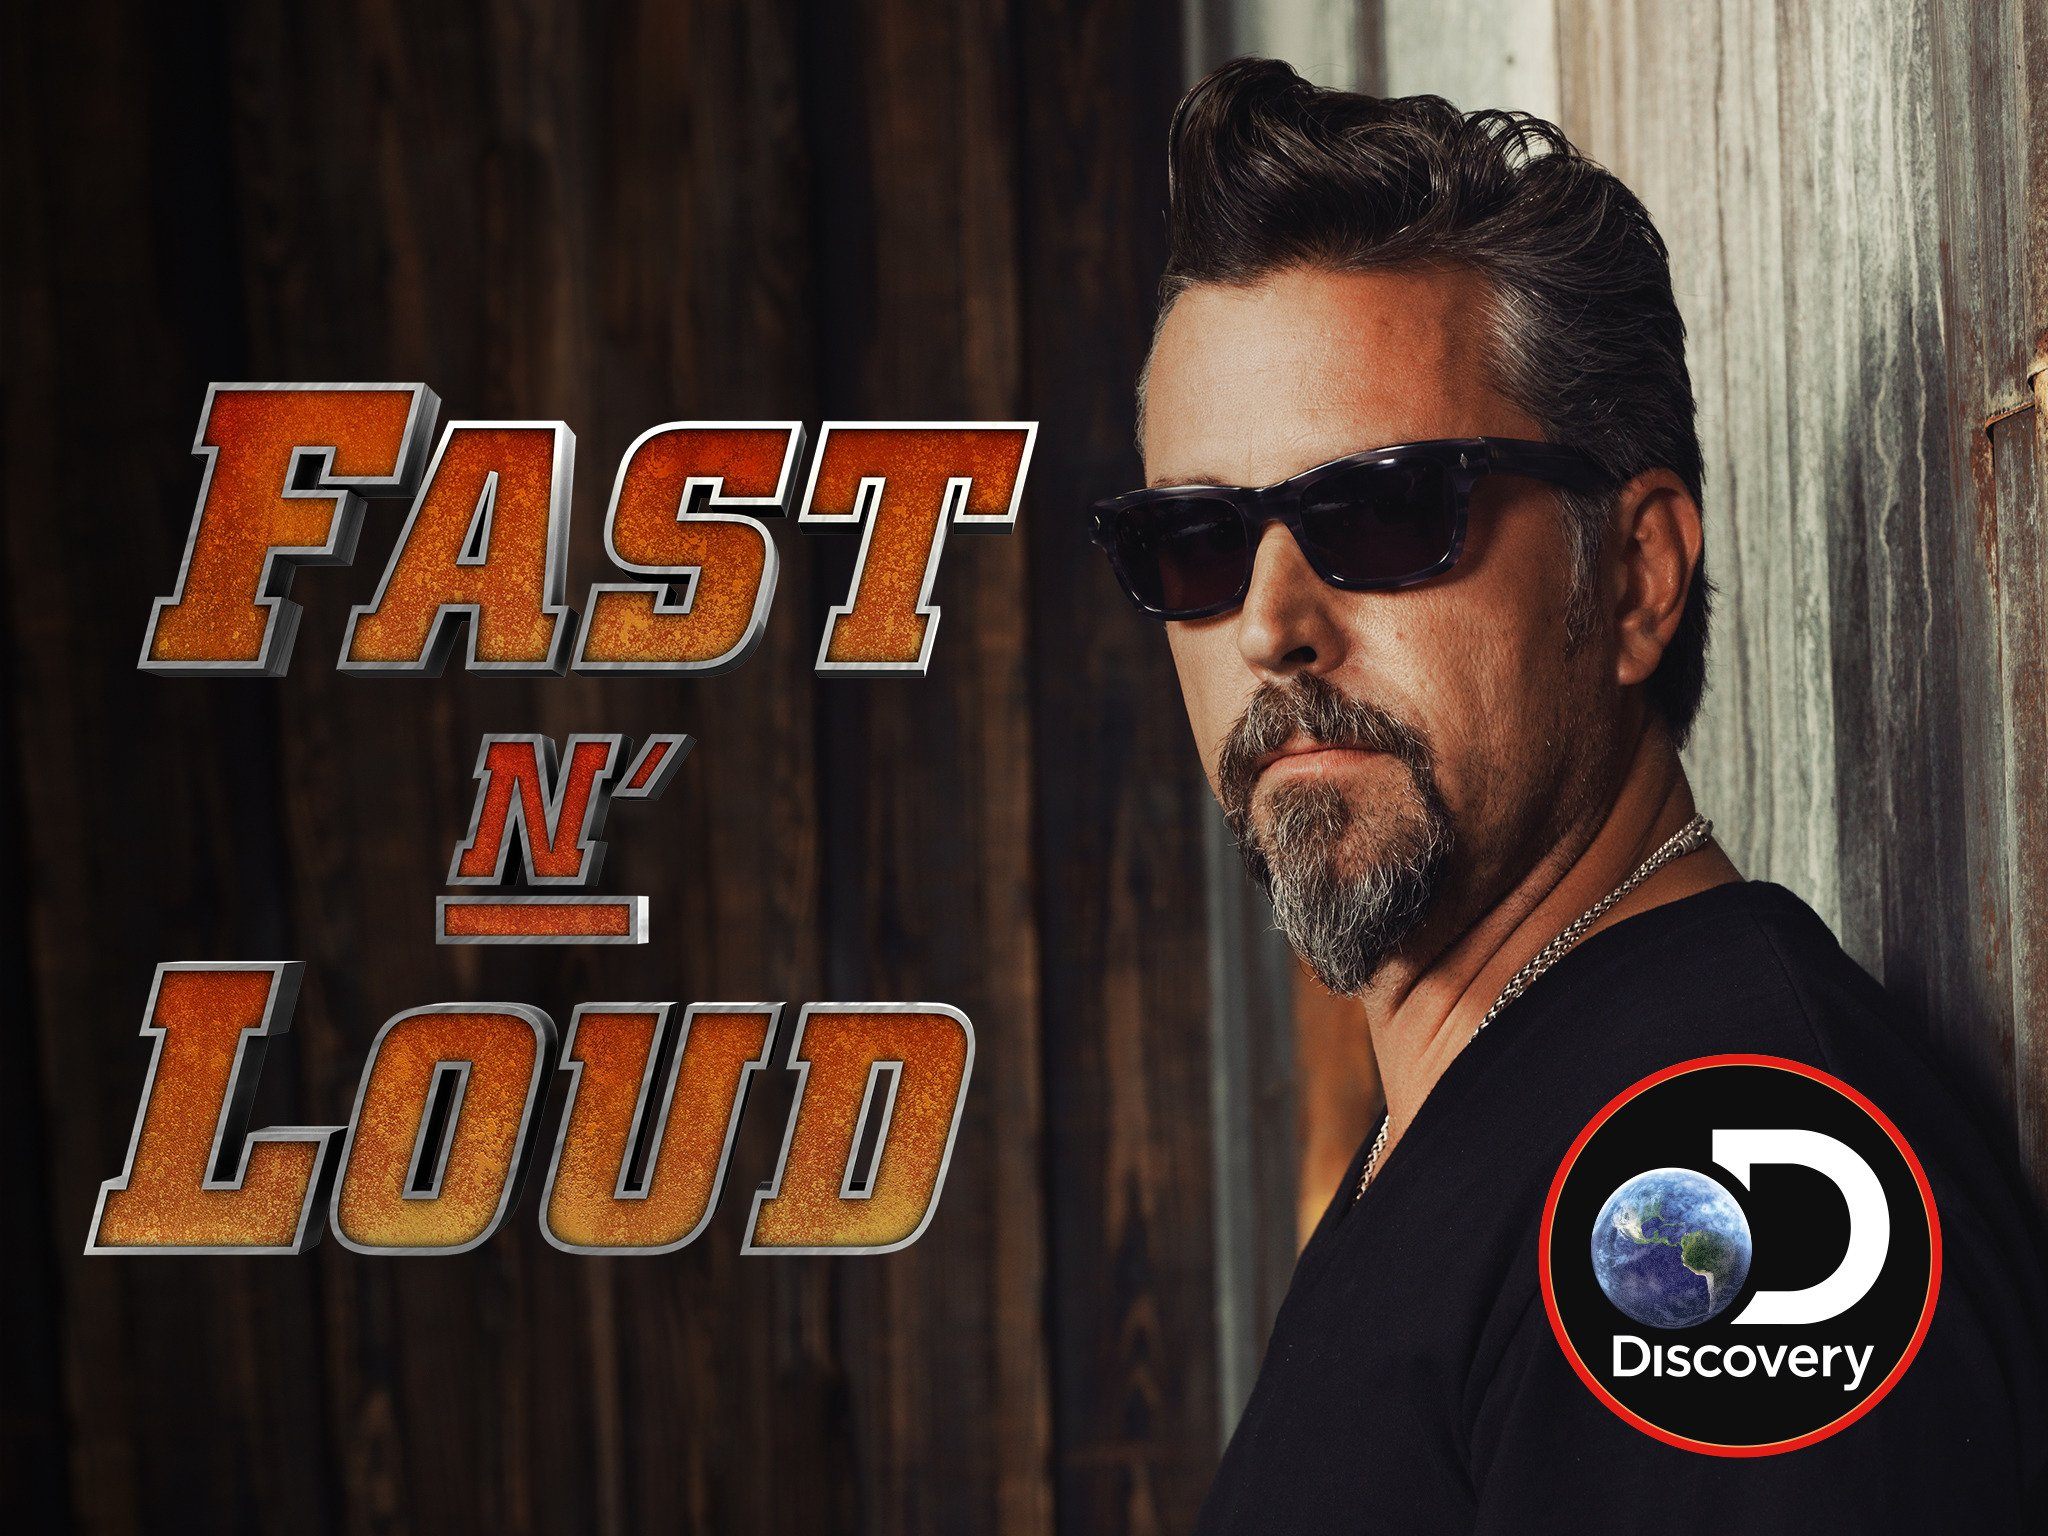 fast n loud season 6 episode 13